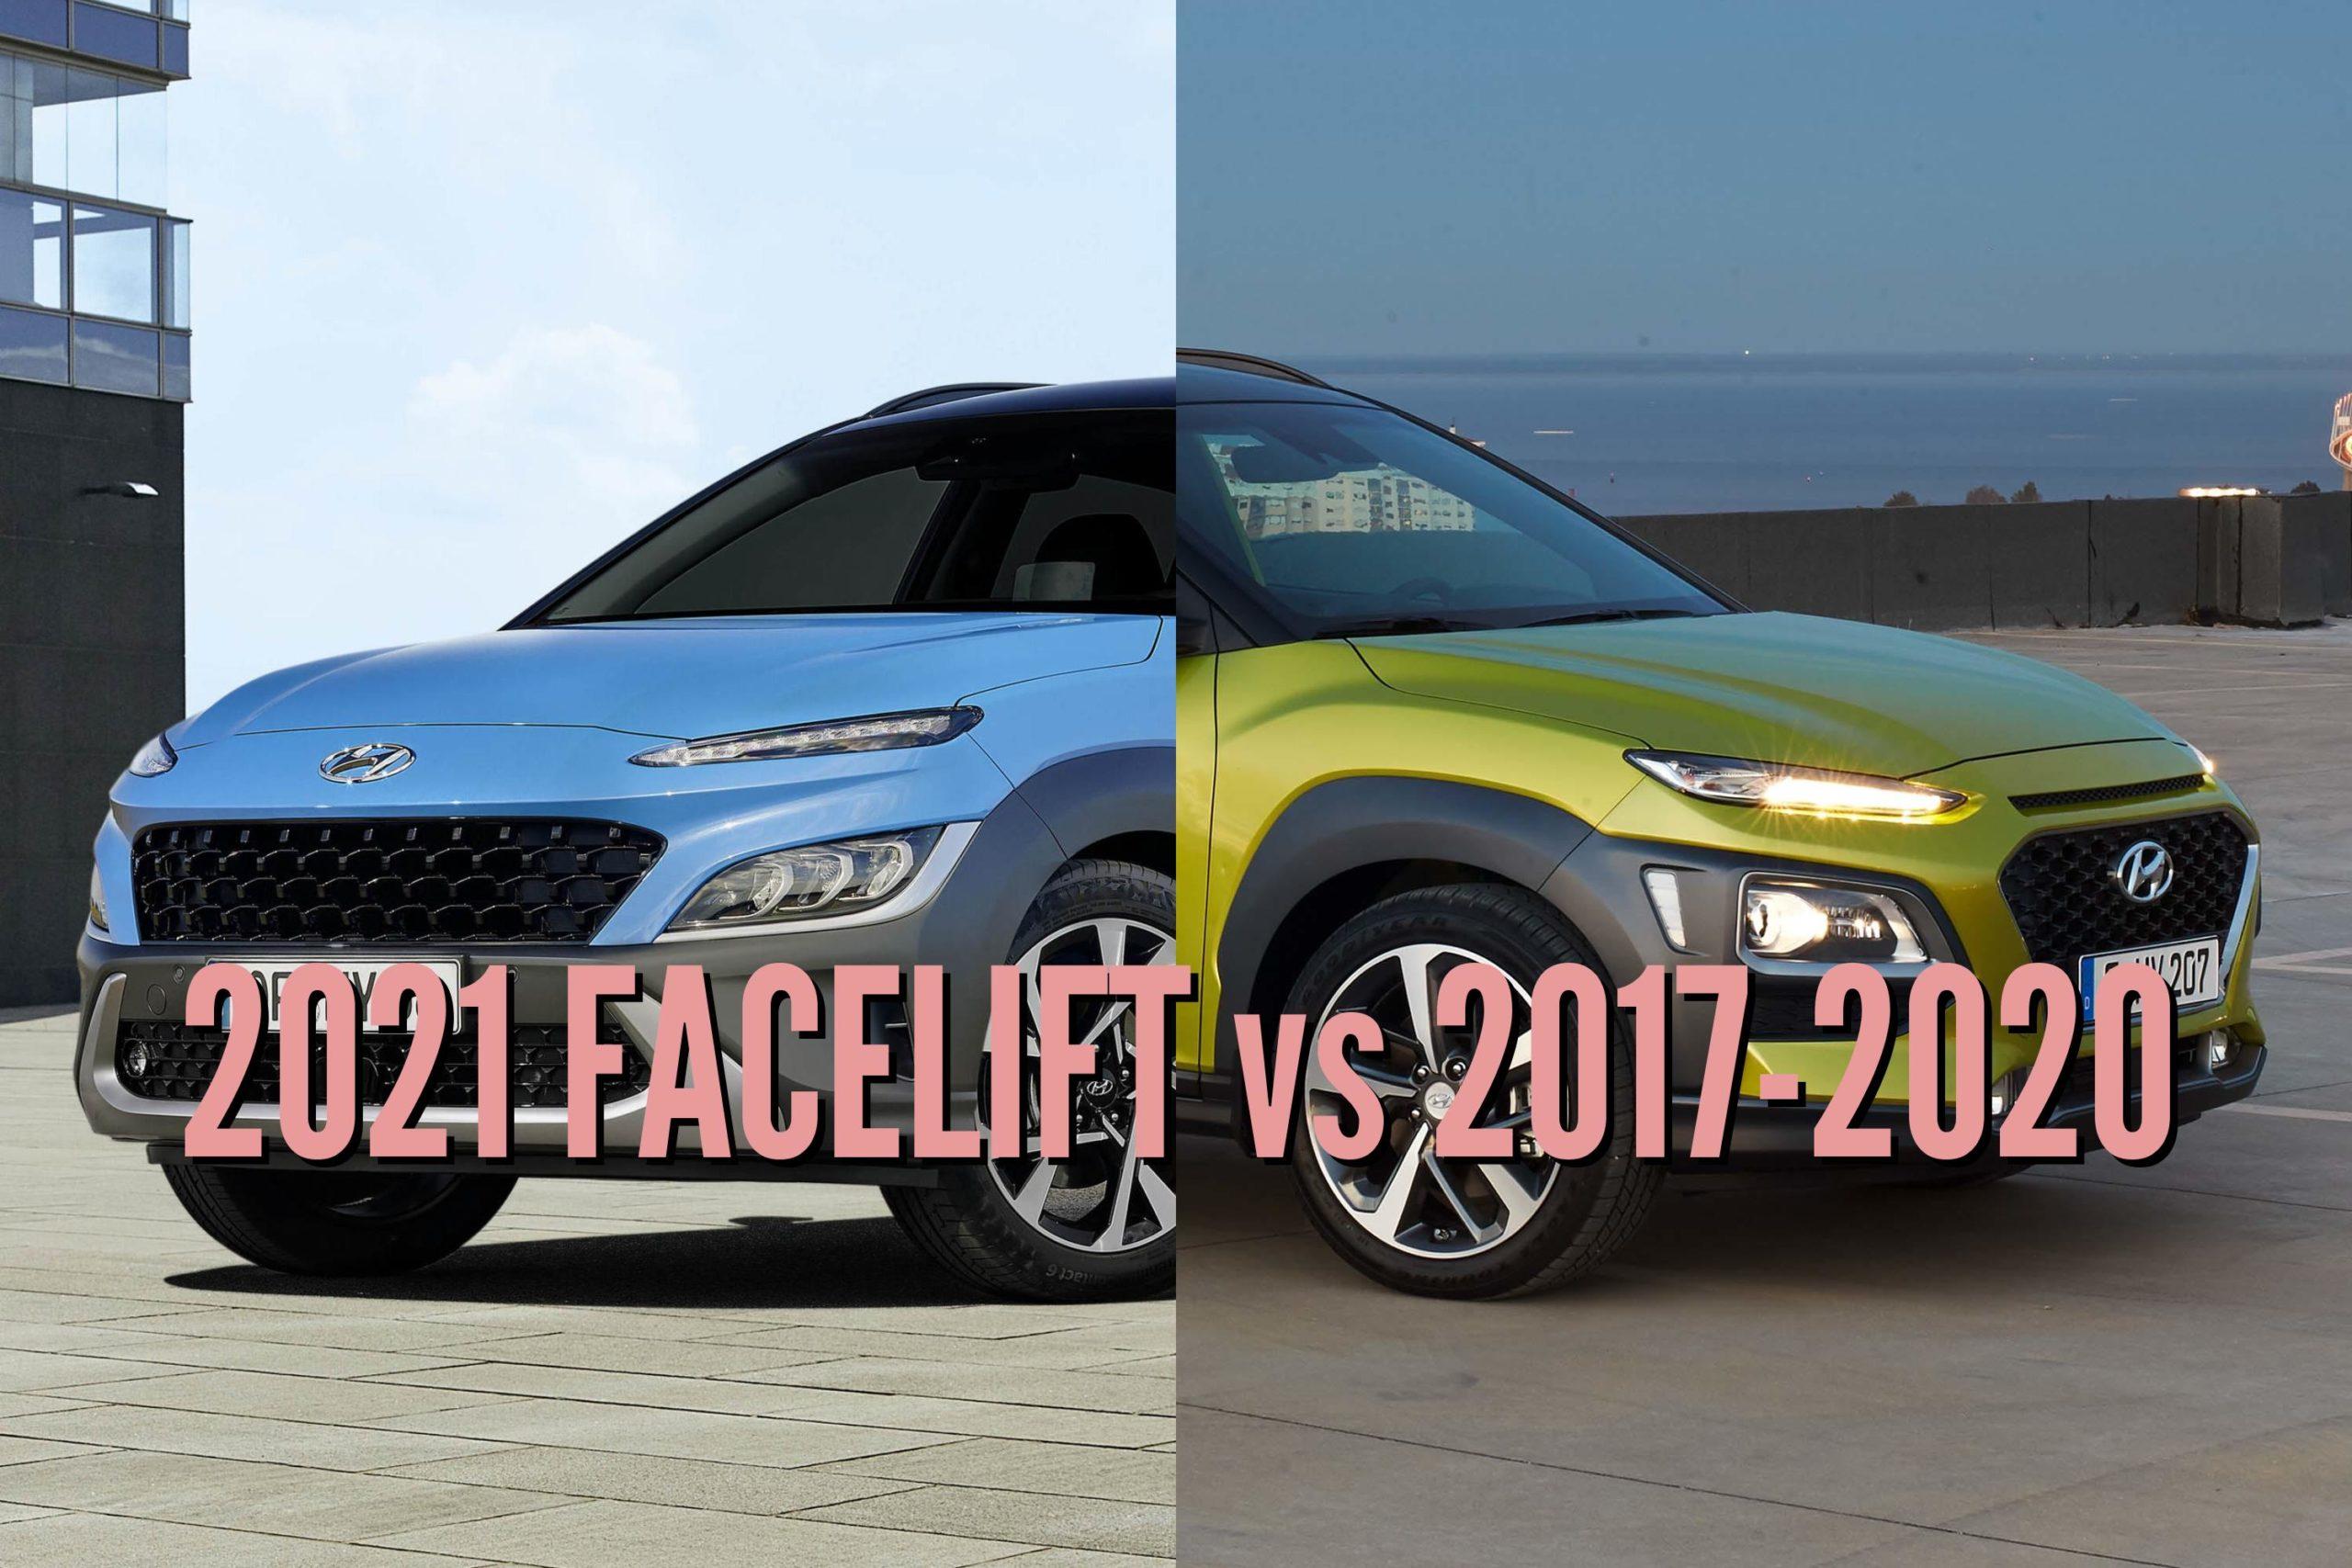 2021 Hyundai Kona vs 2017-2020: Facelift changes & differences